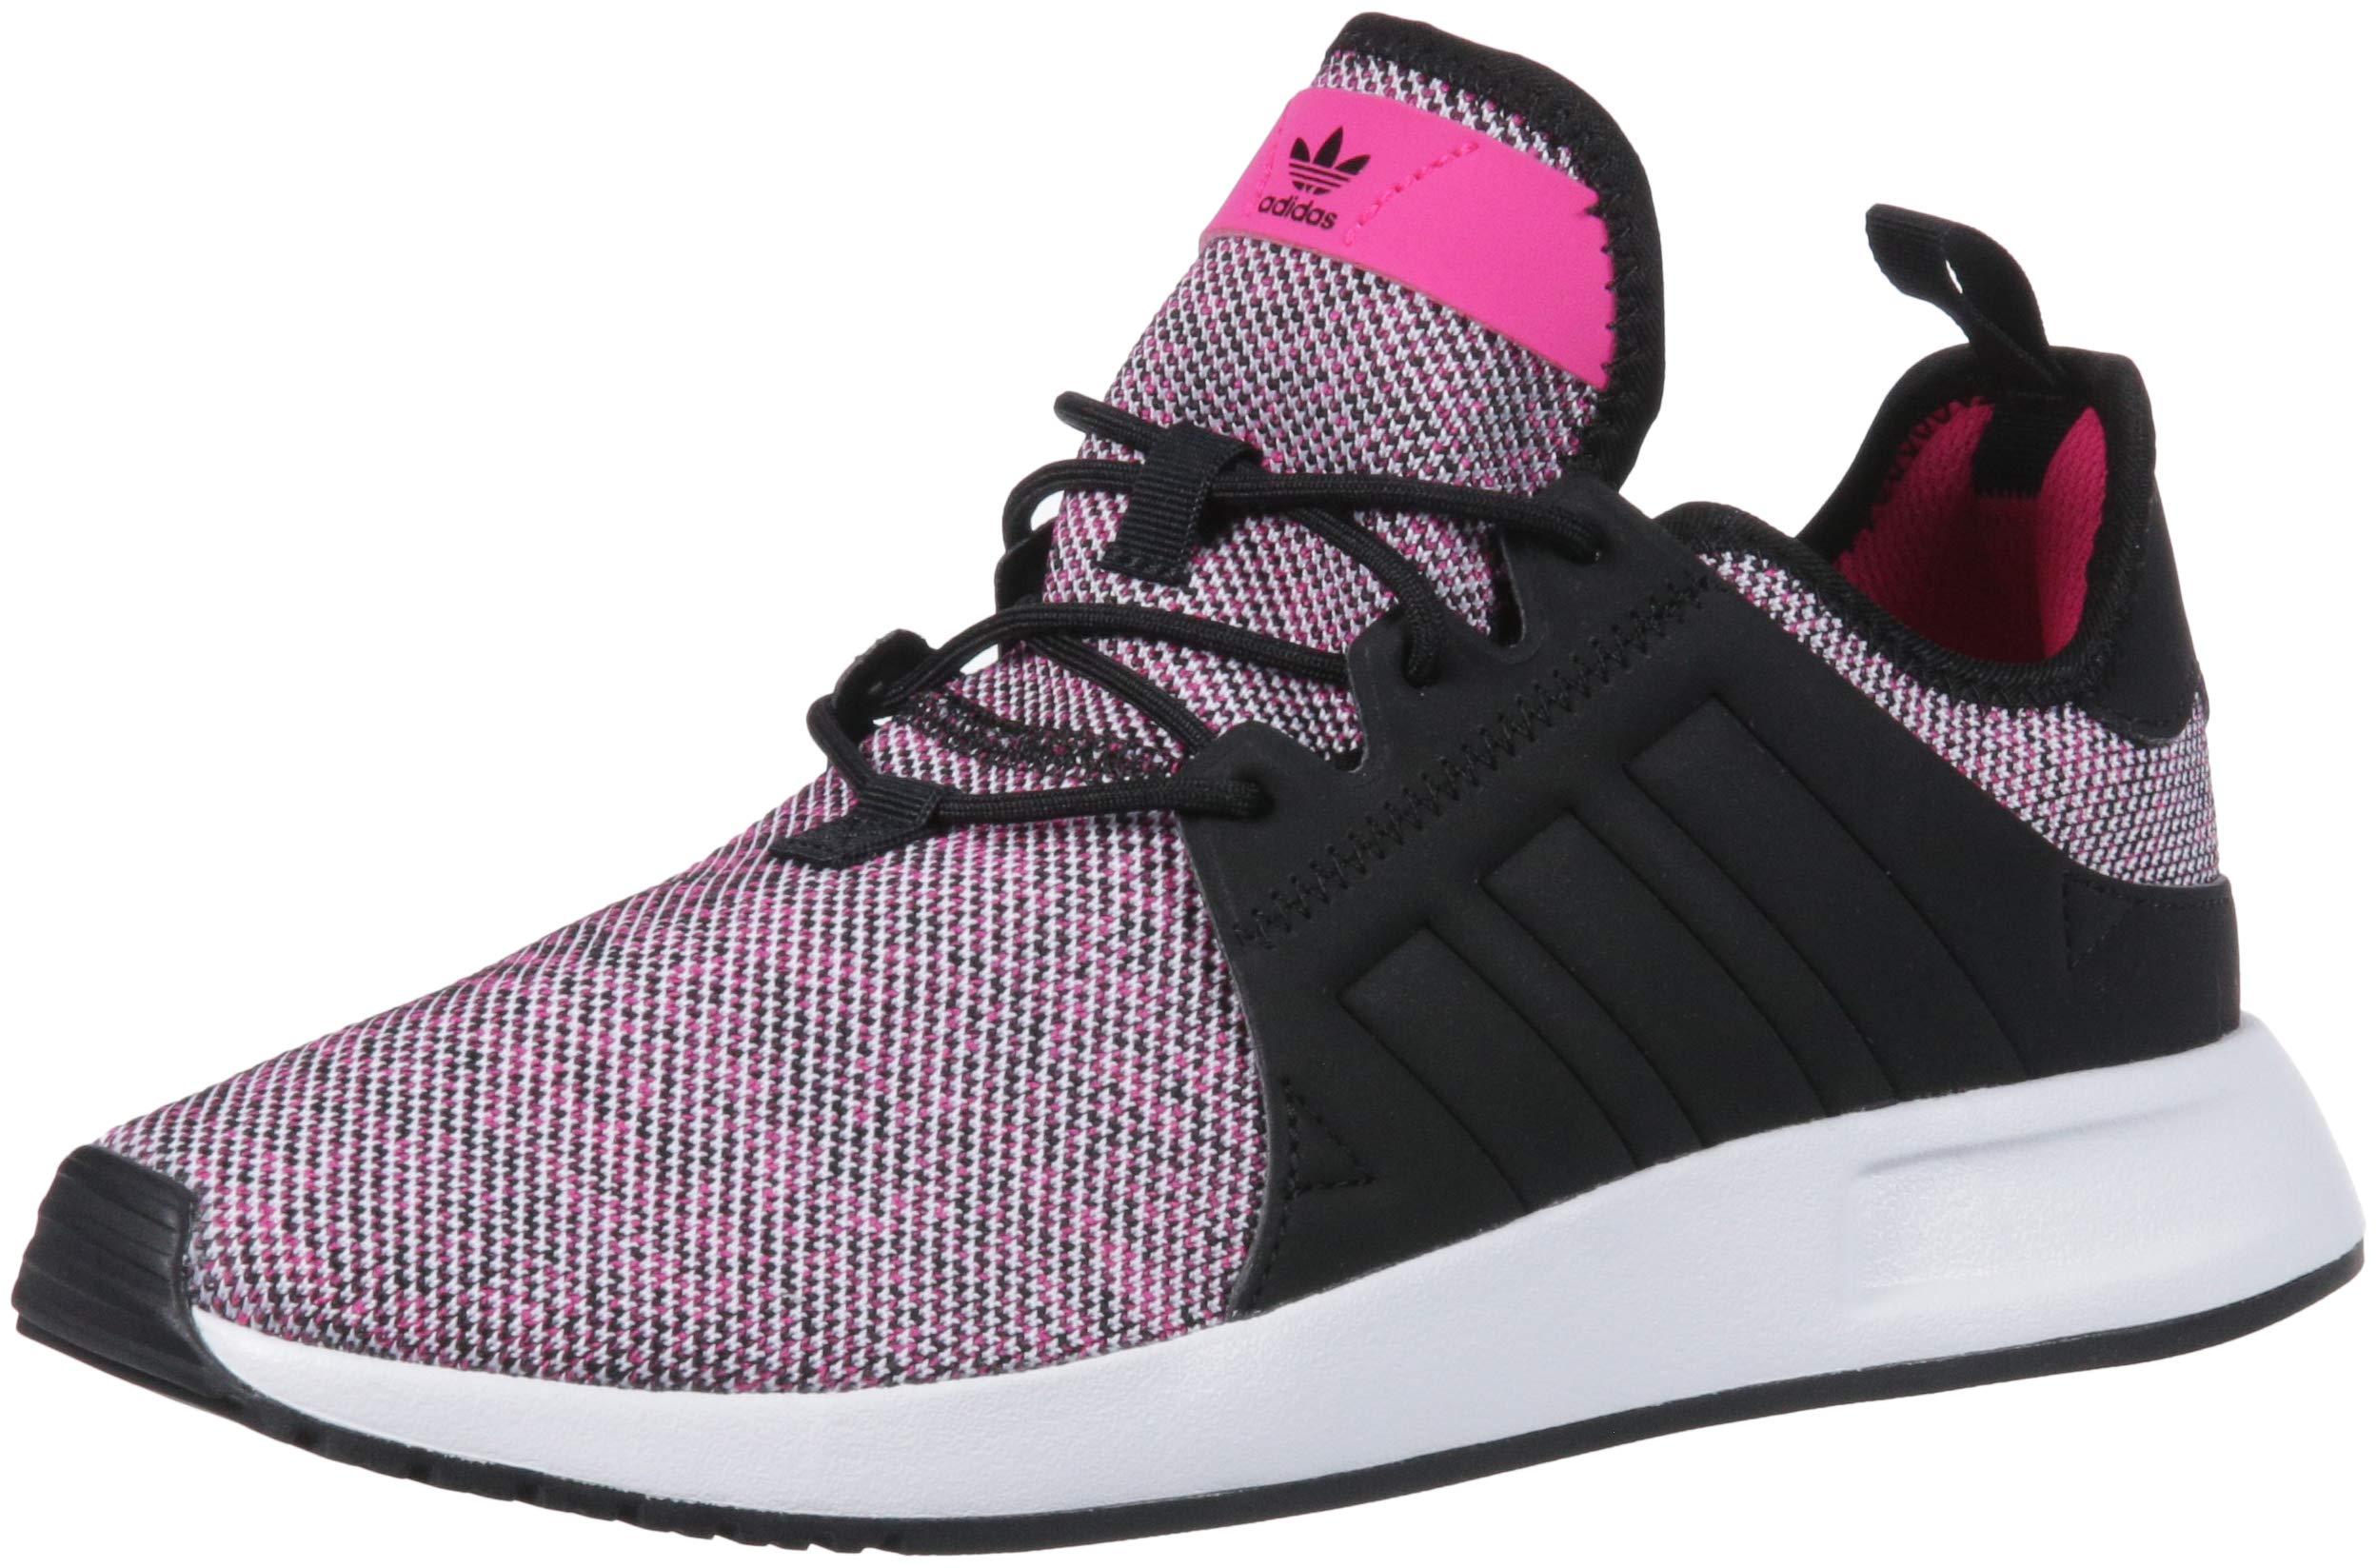 adidas Originals Unisex X_PLR Running Shoe Light Grey HeatherBlackWhite 1 M US Little Kid